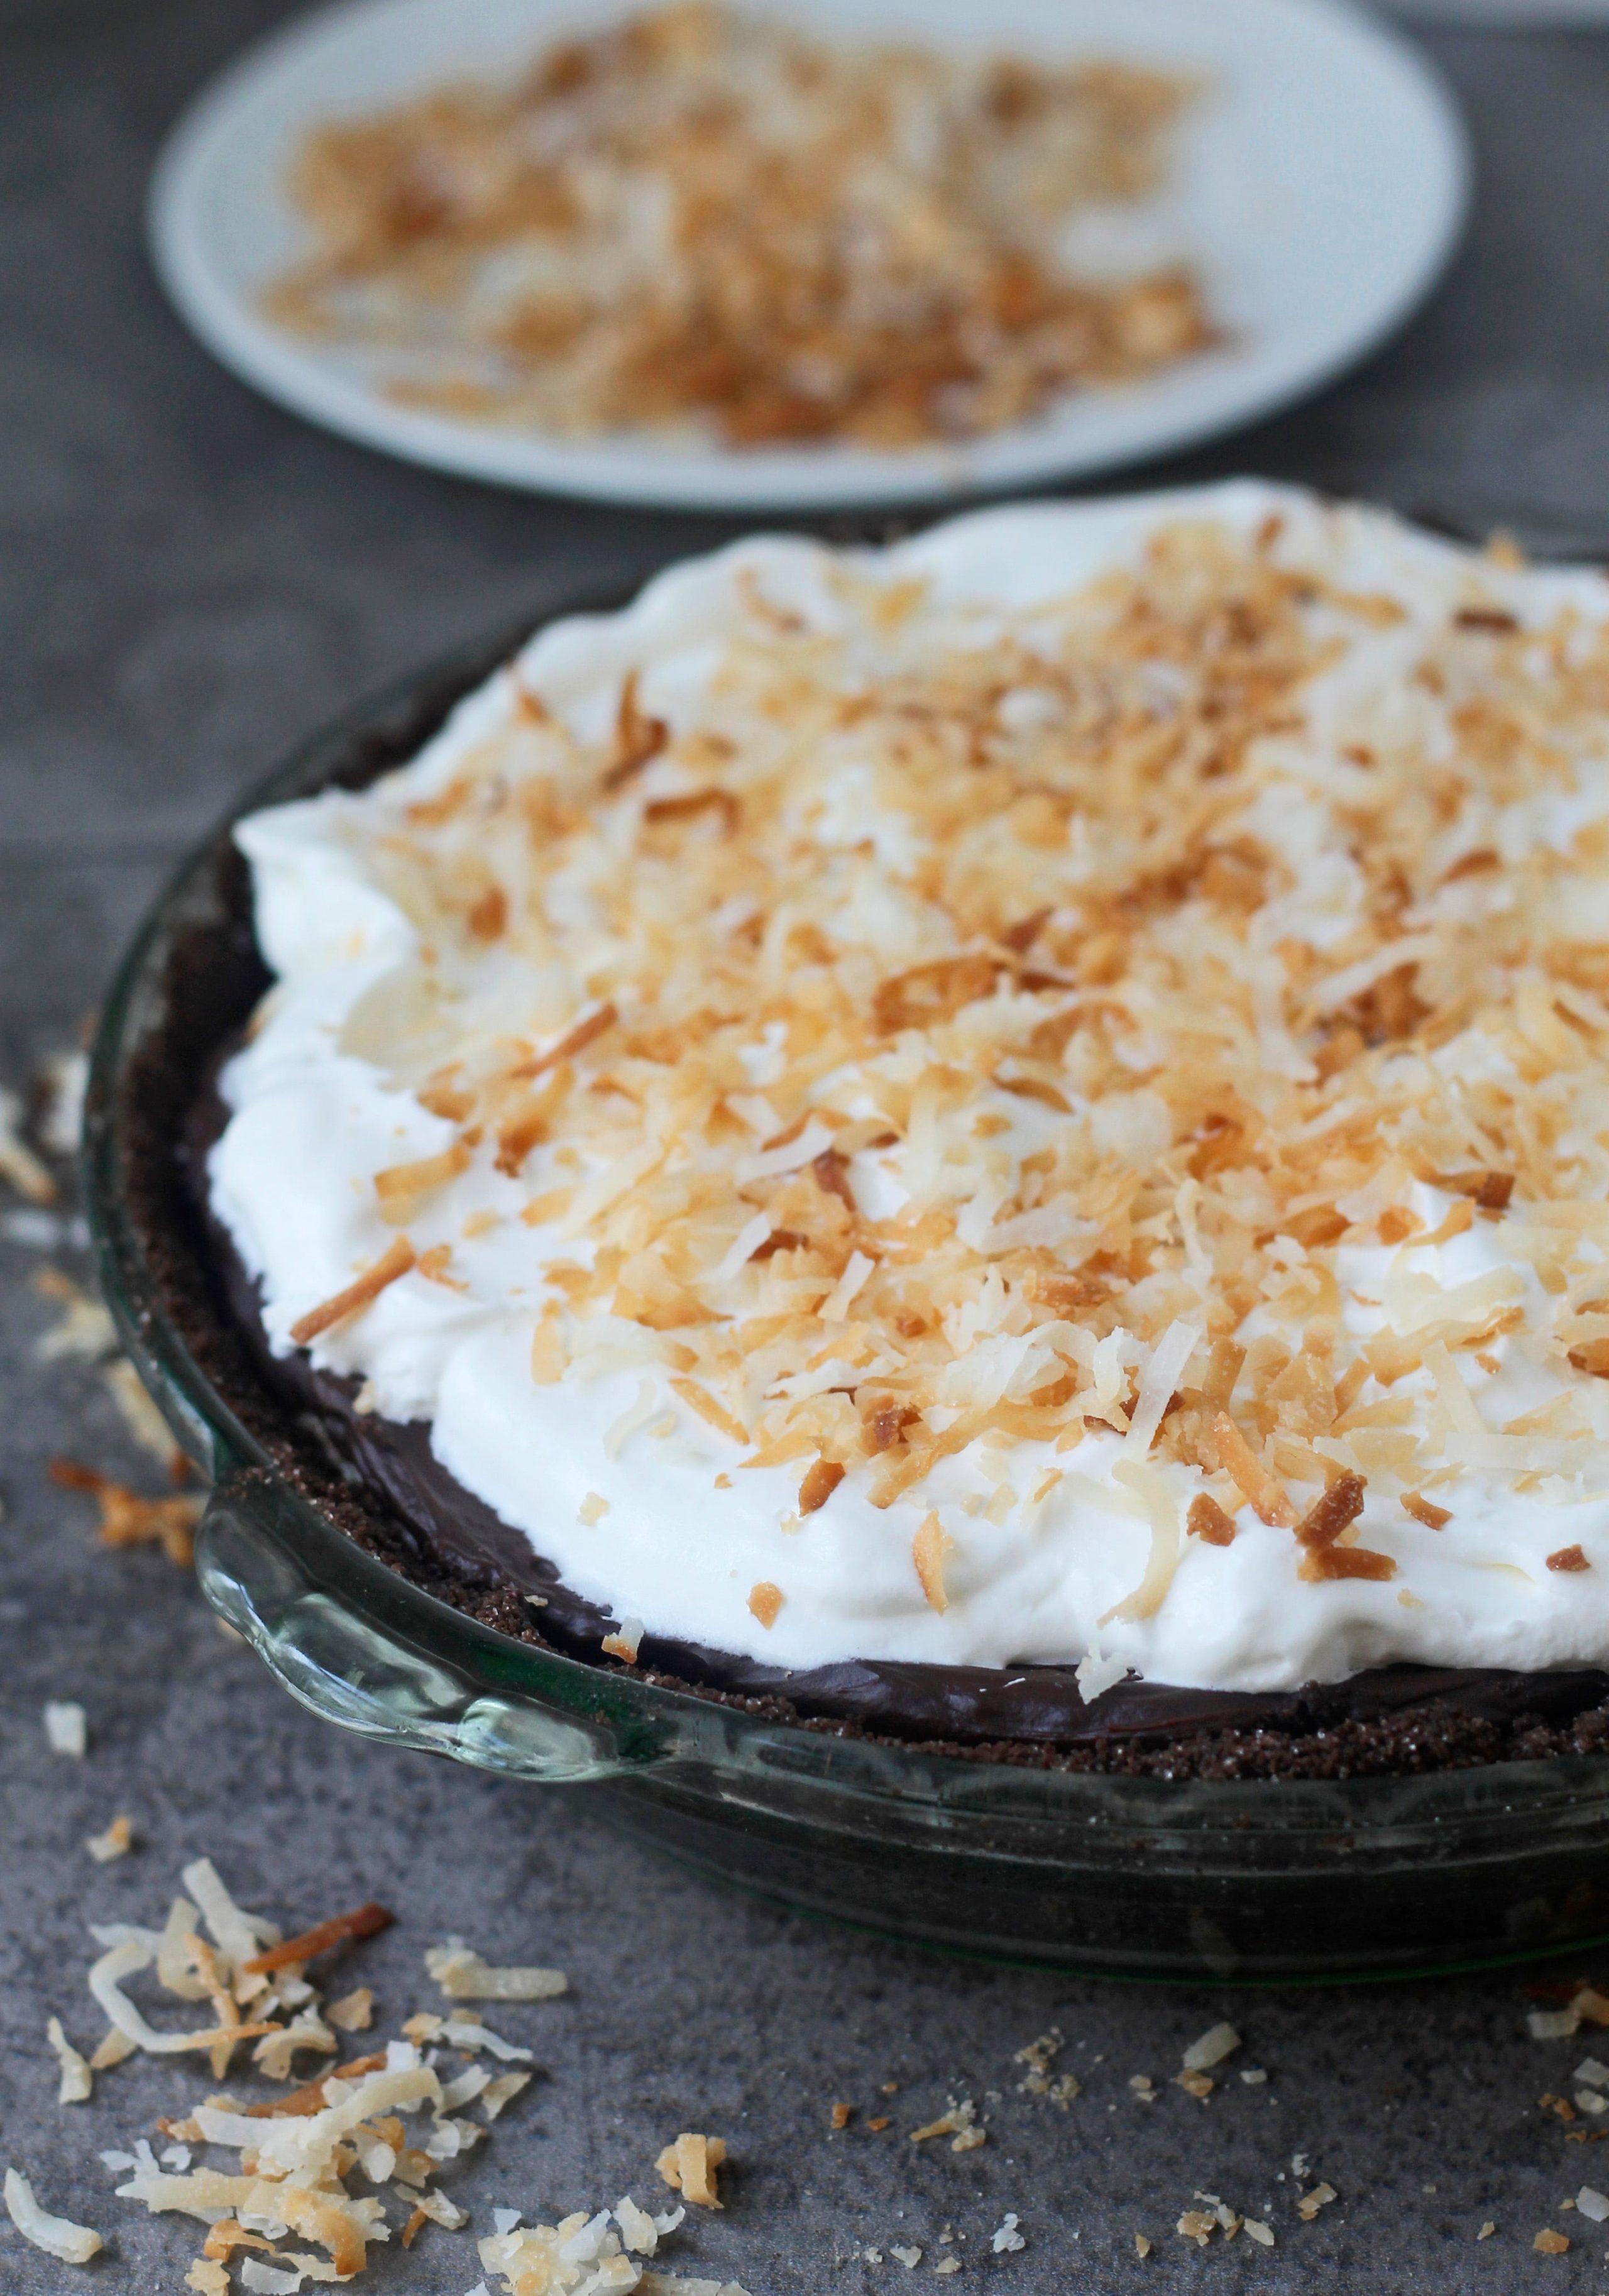 Pumpkin Cream Pie with Chocolate Ganache and Chocolate Graham Cracker Crust